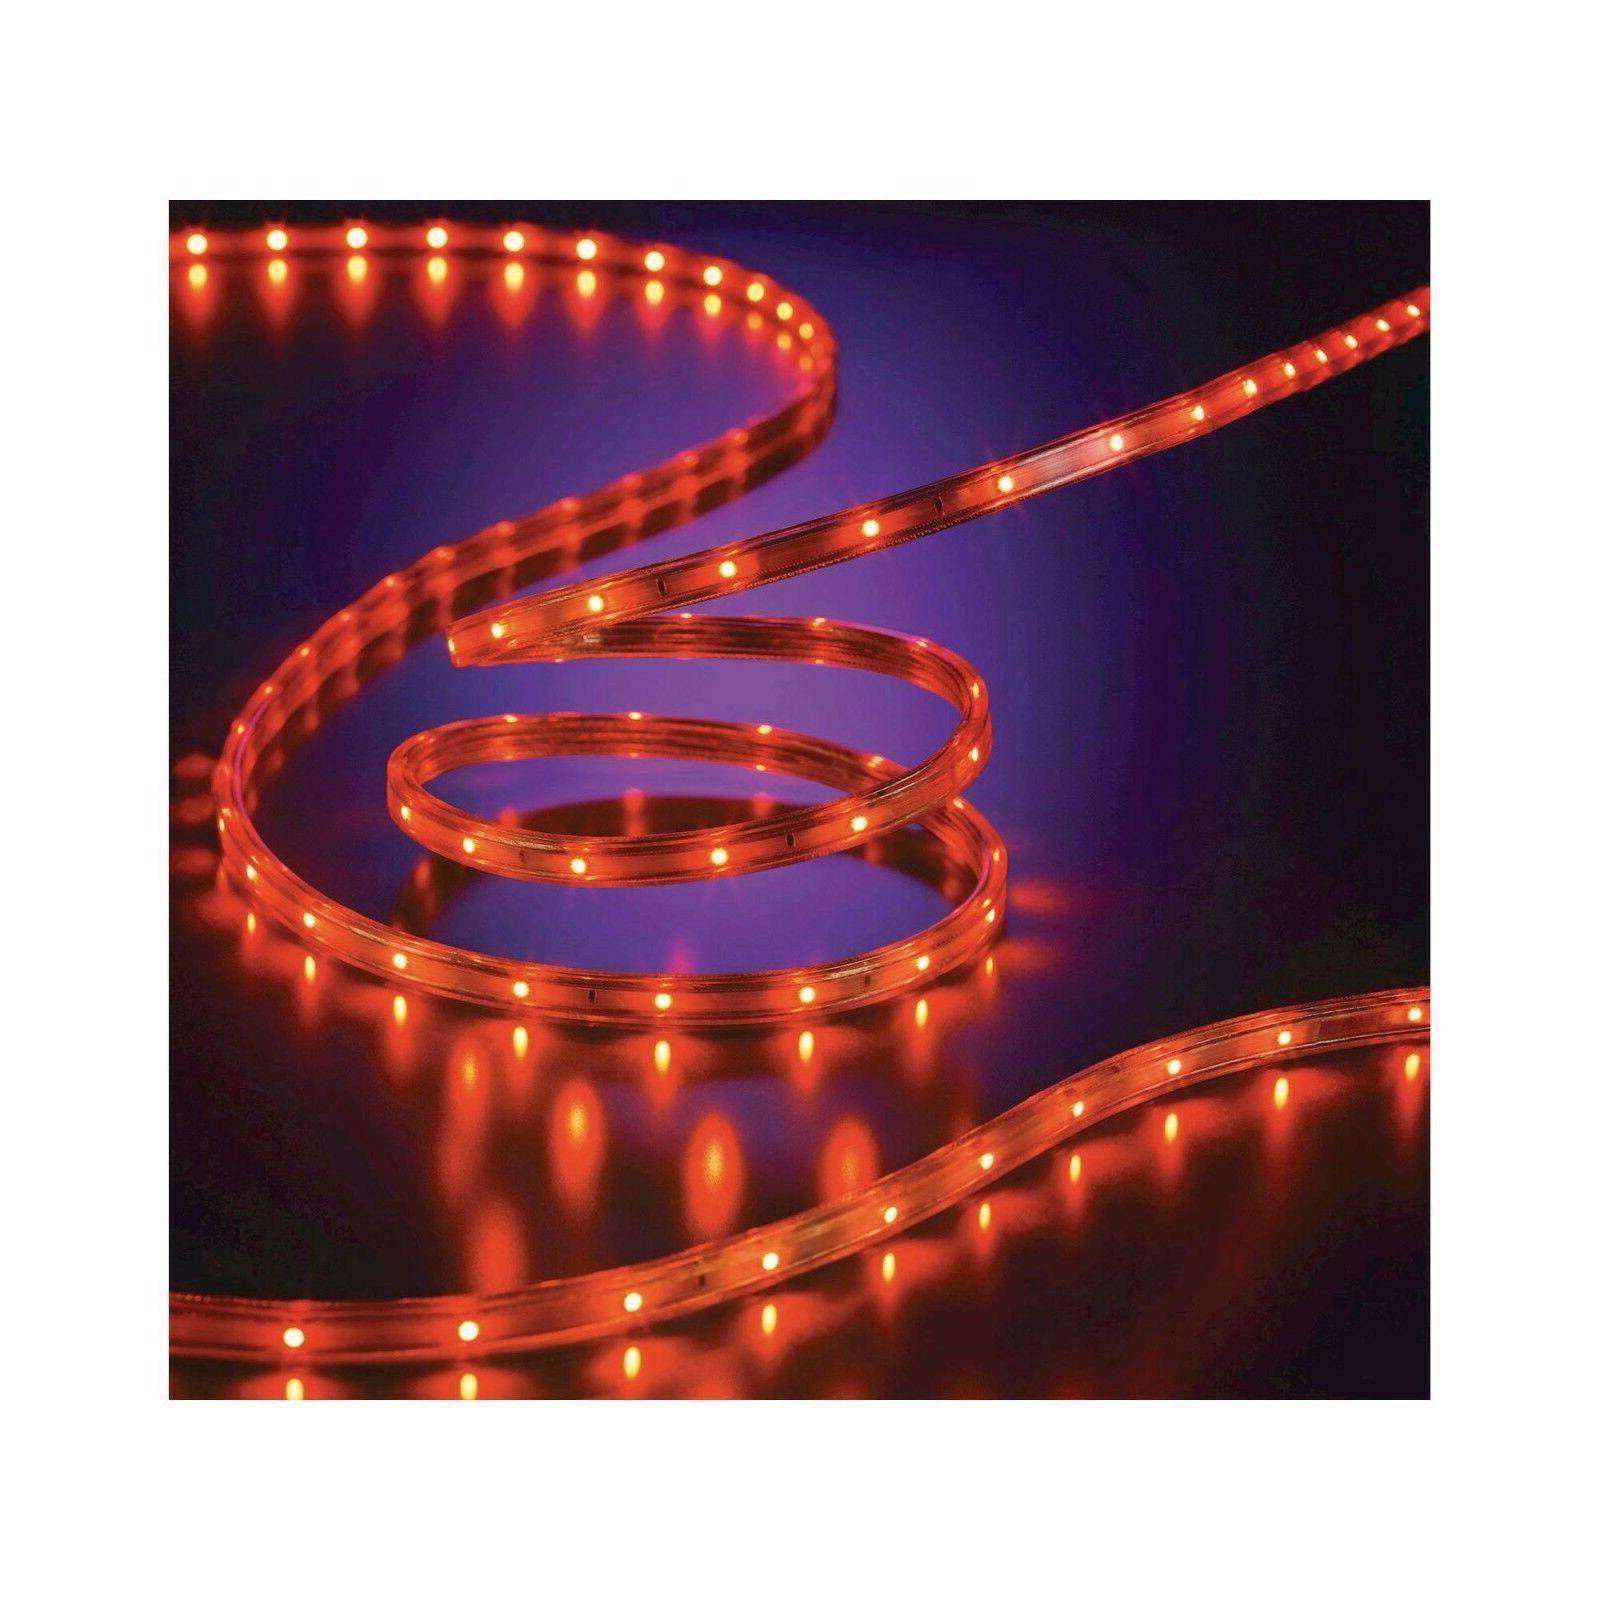 New Rope Philips LED ct Rope Orange Outdoor